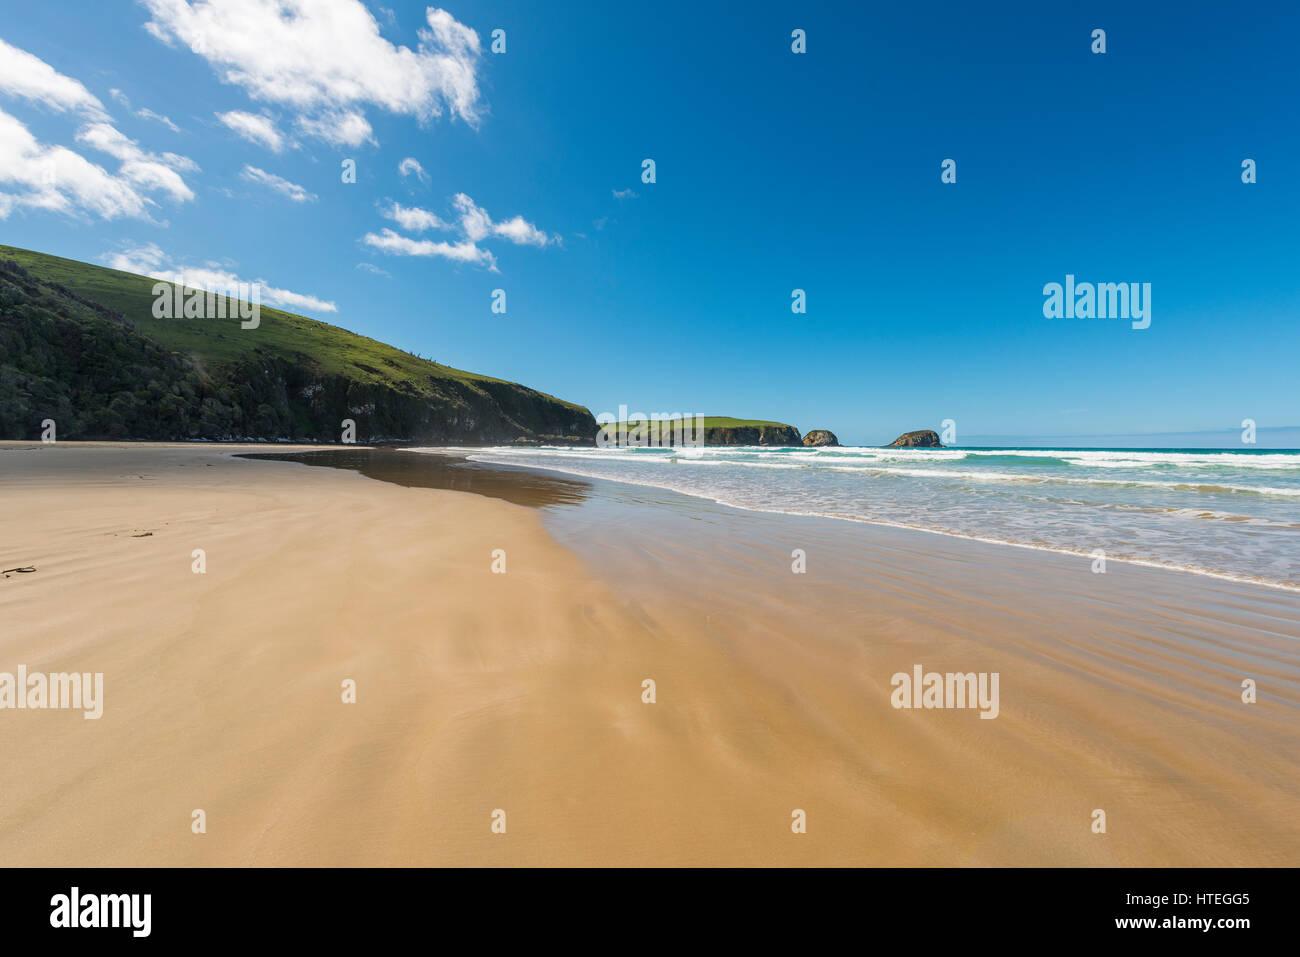 Sandstrand, tautuku Bay, die Catlins, Süden Region, Southland, Neuseeland Stockbild